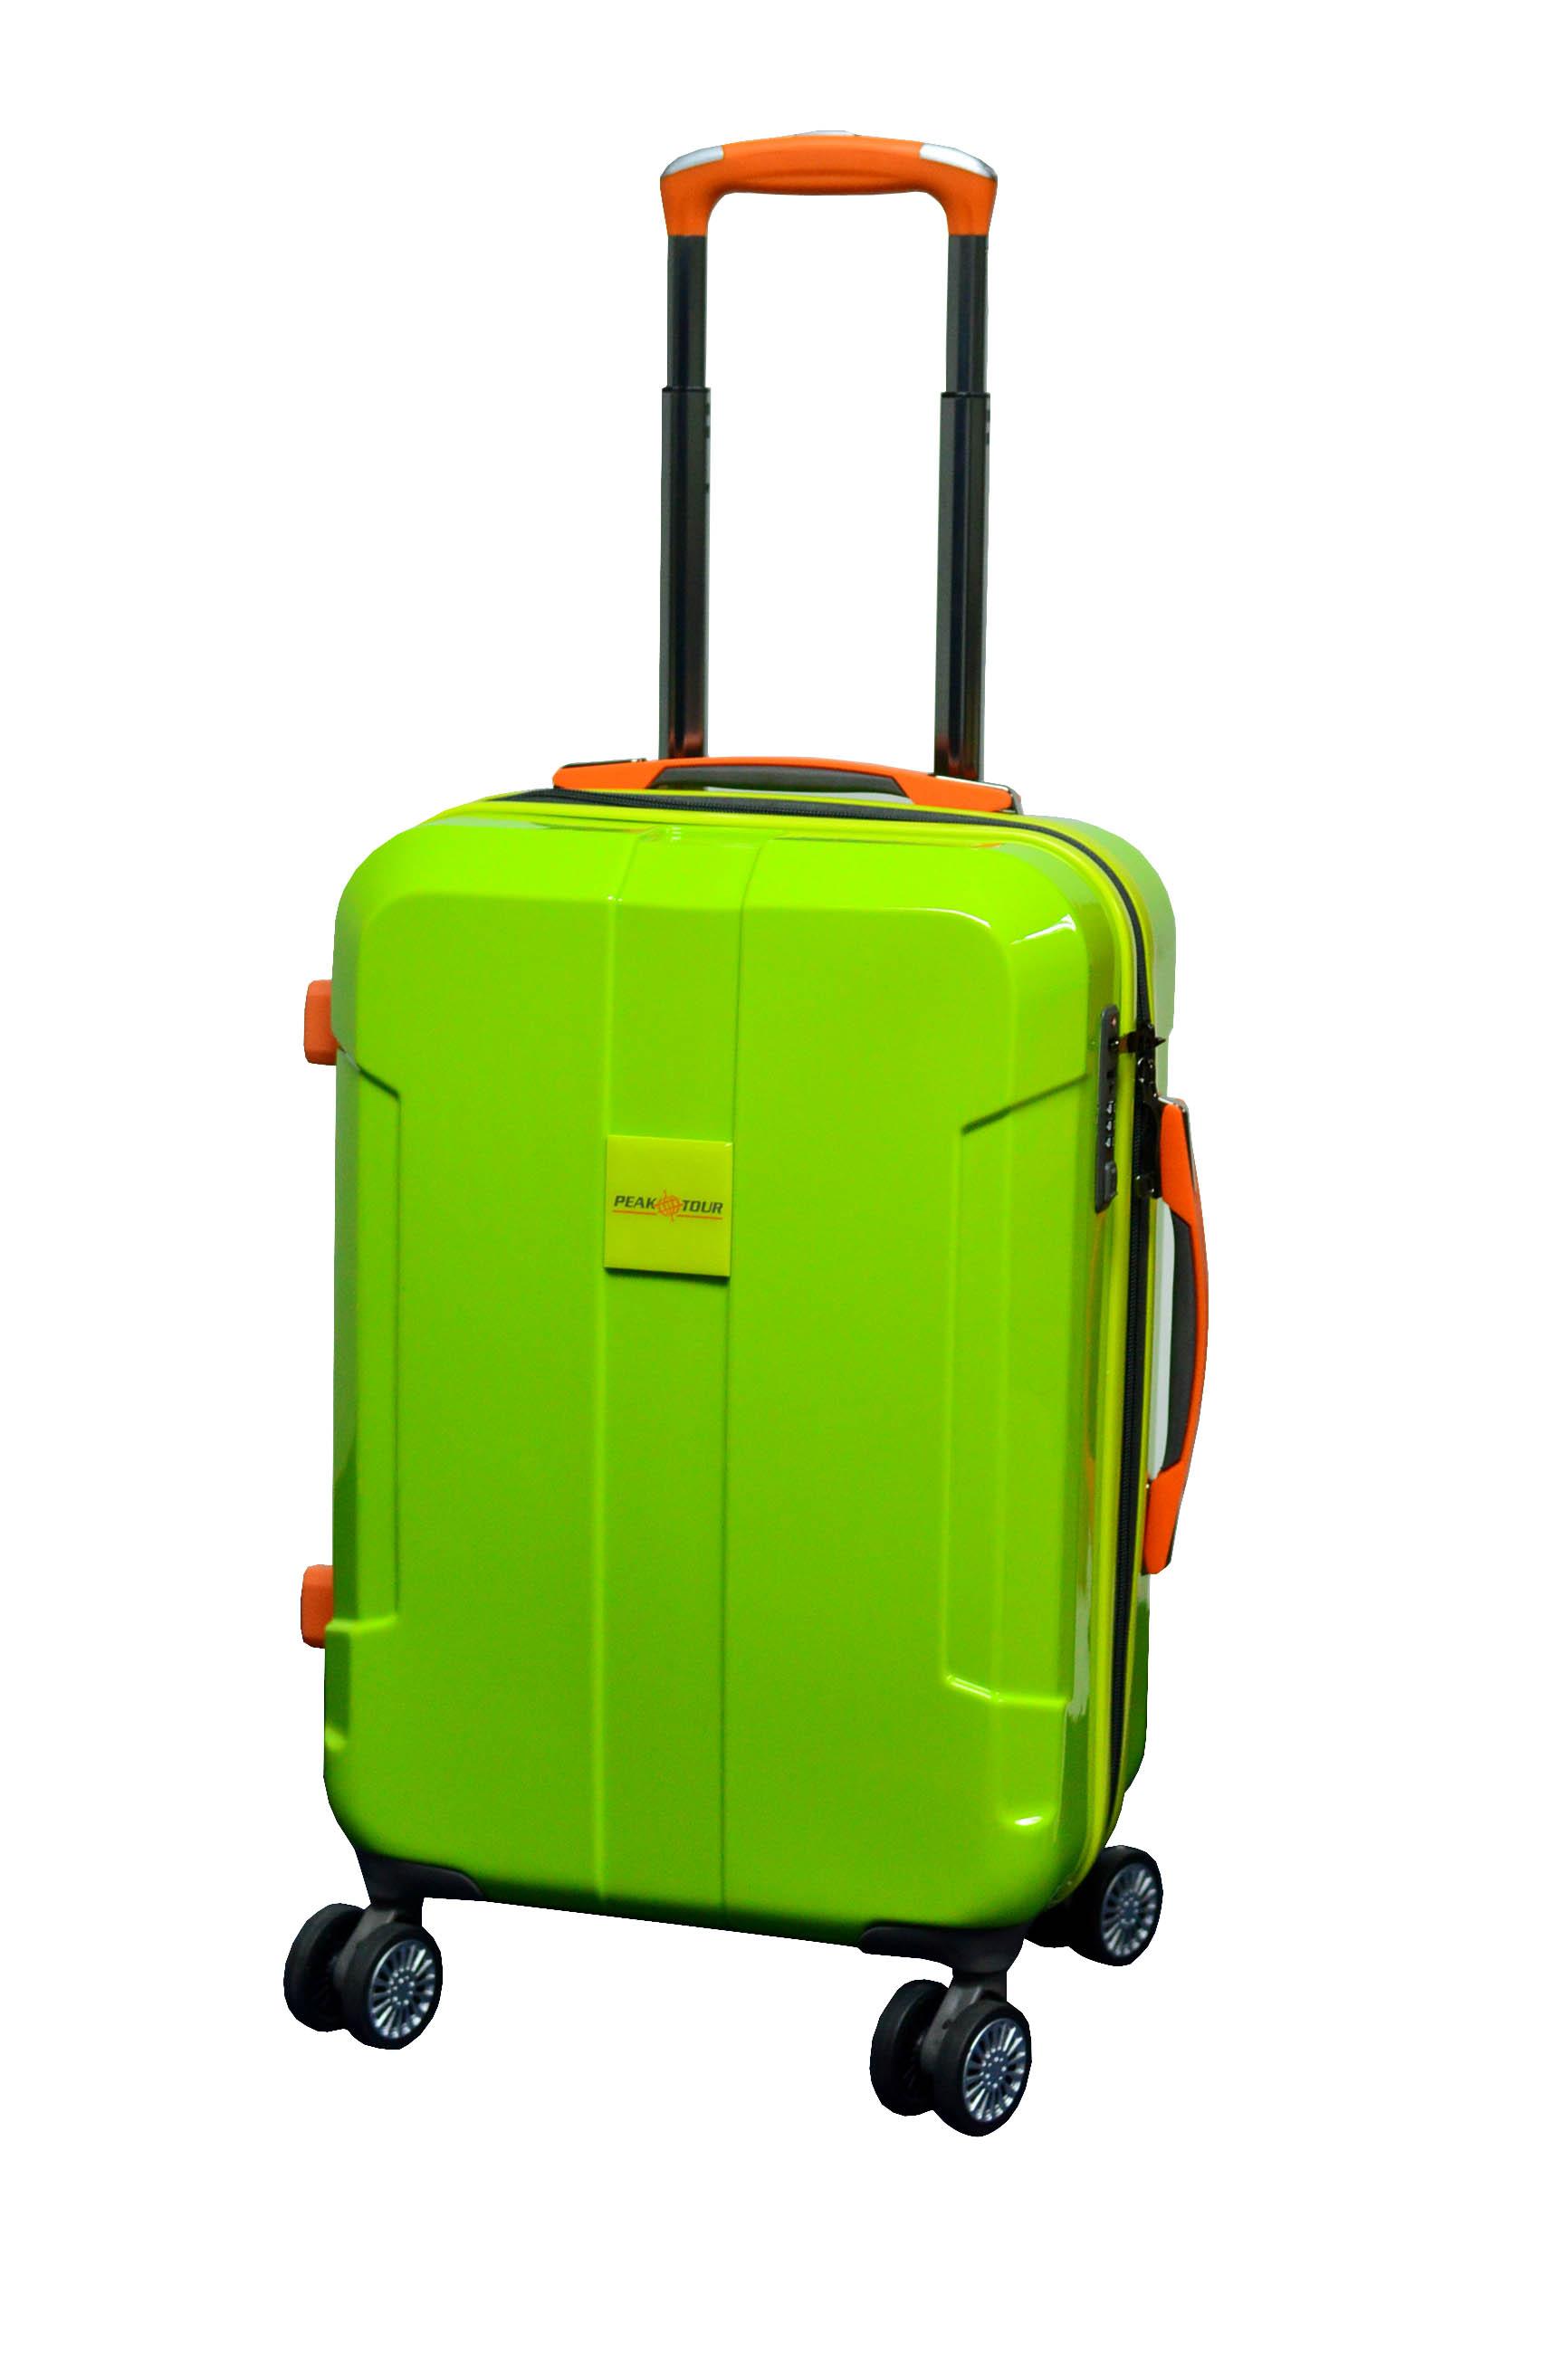 New Form PC Luggage Set